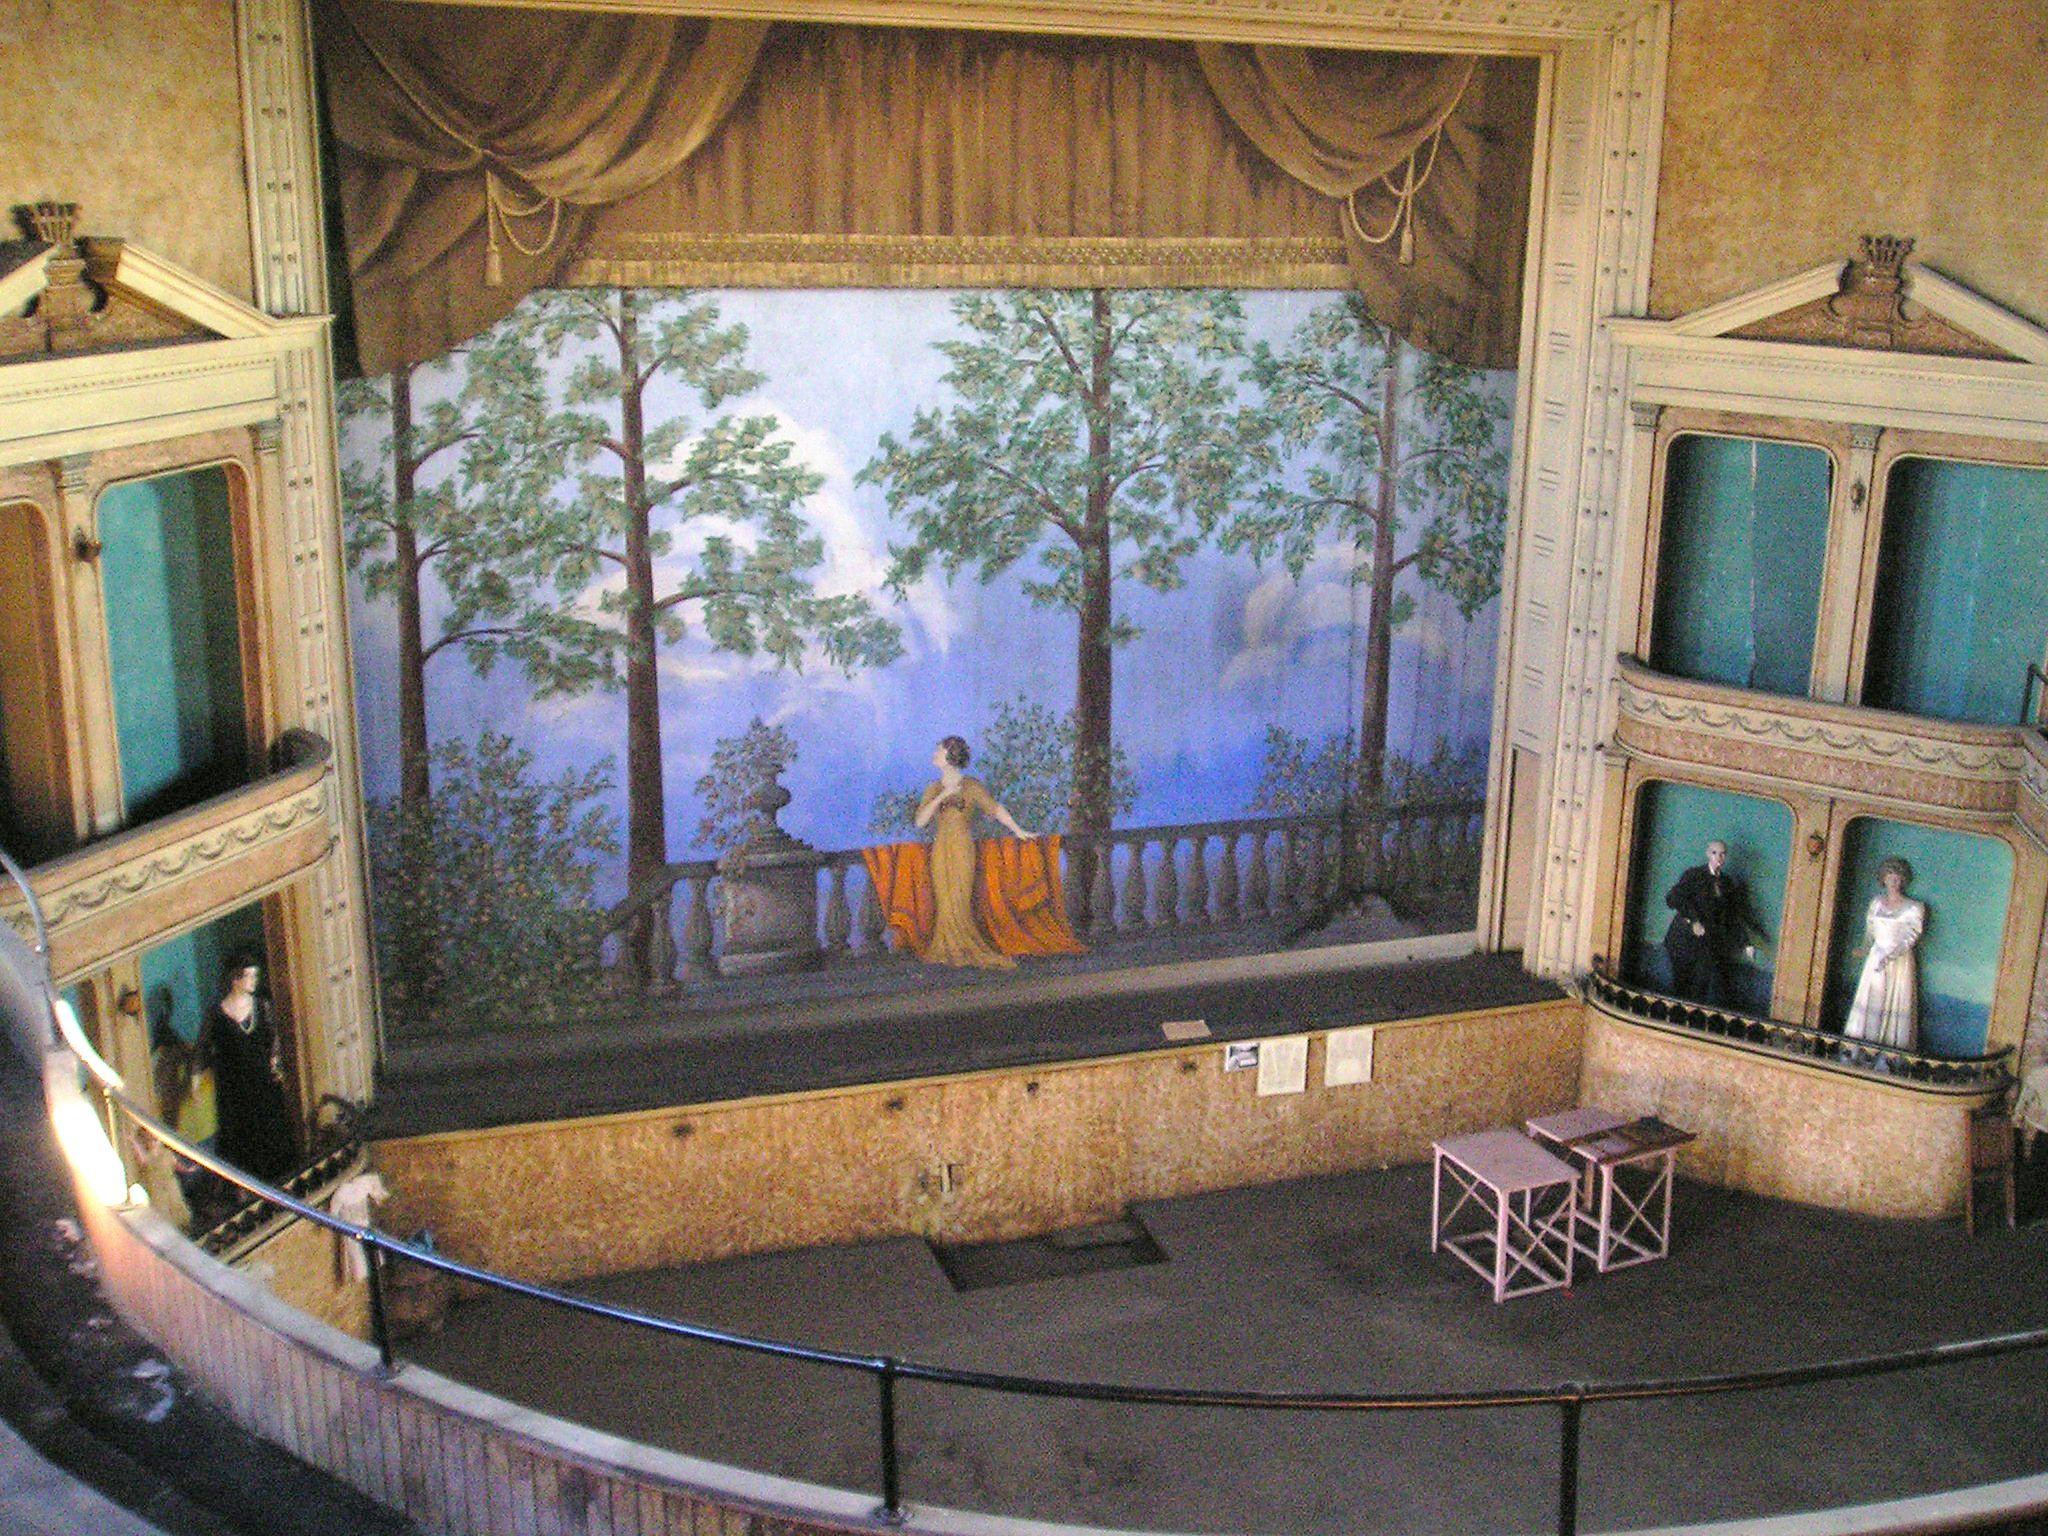 Bell S Opera House In Hillsboro Ohio Historic Theatres Houses Pinterest And